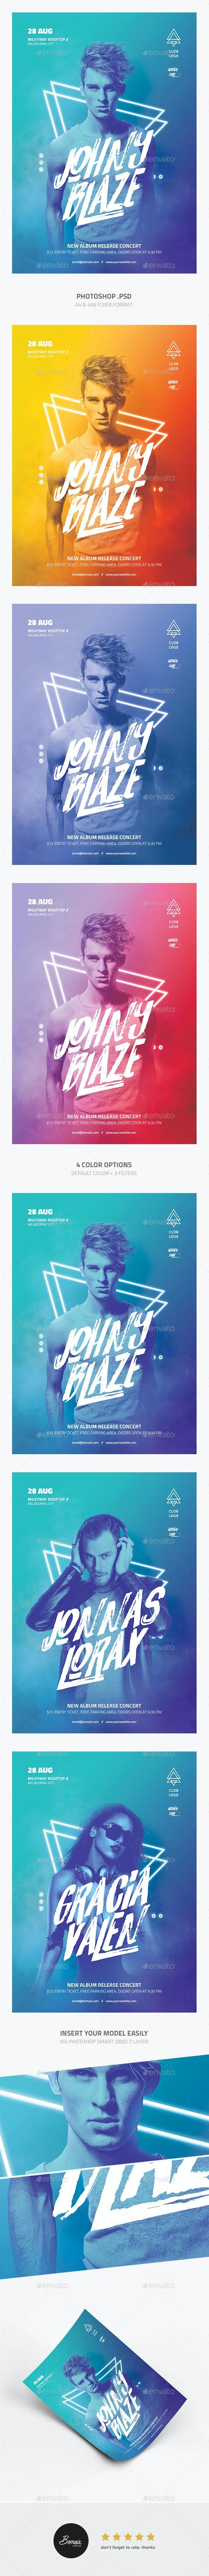 DJ Concert Flyer - Concerts Events